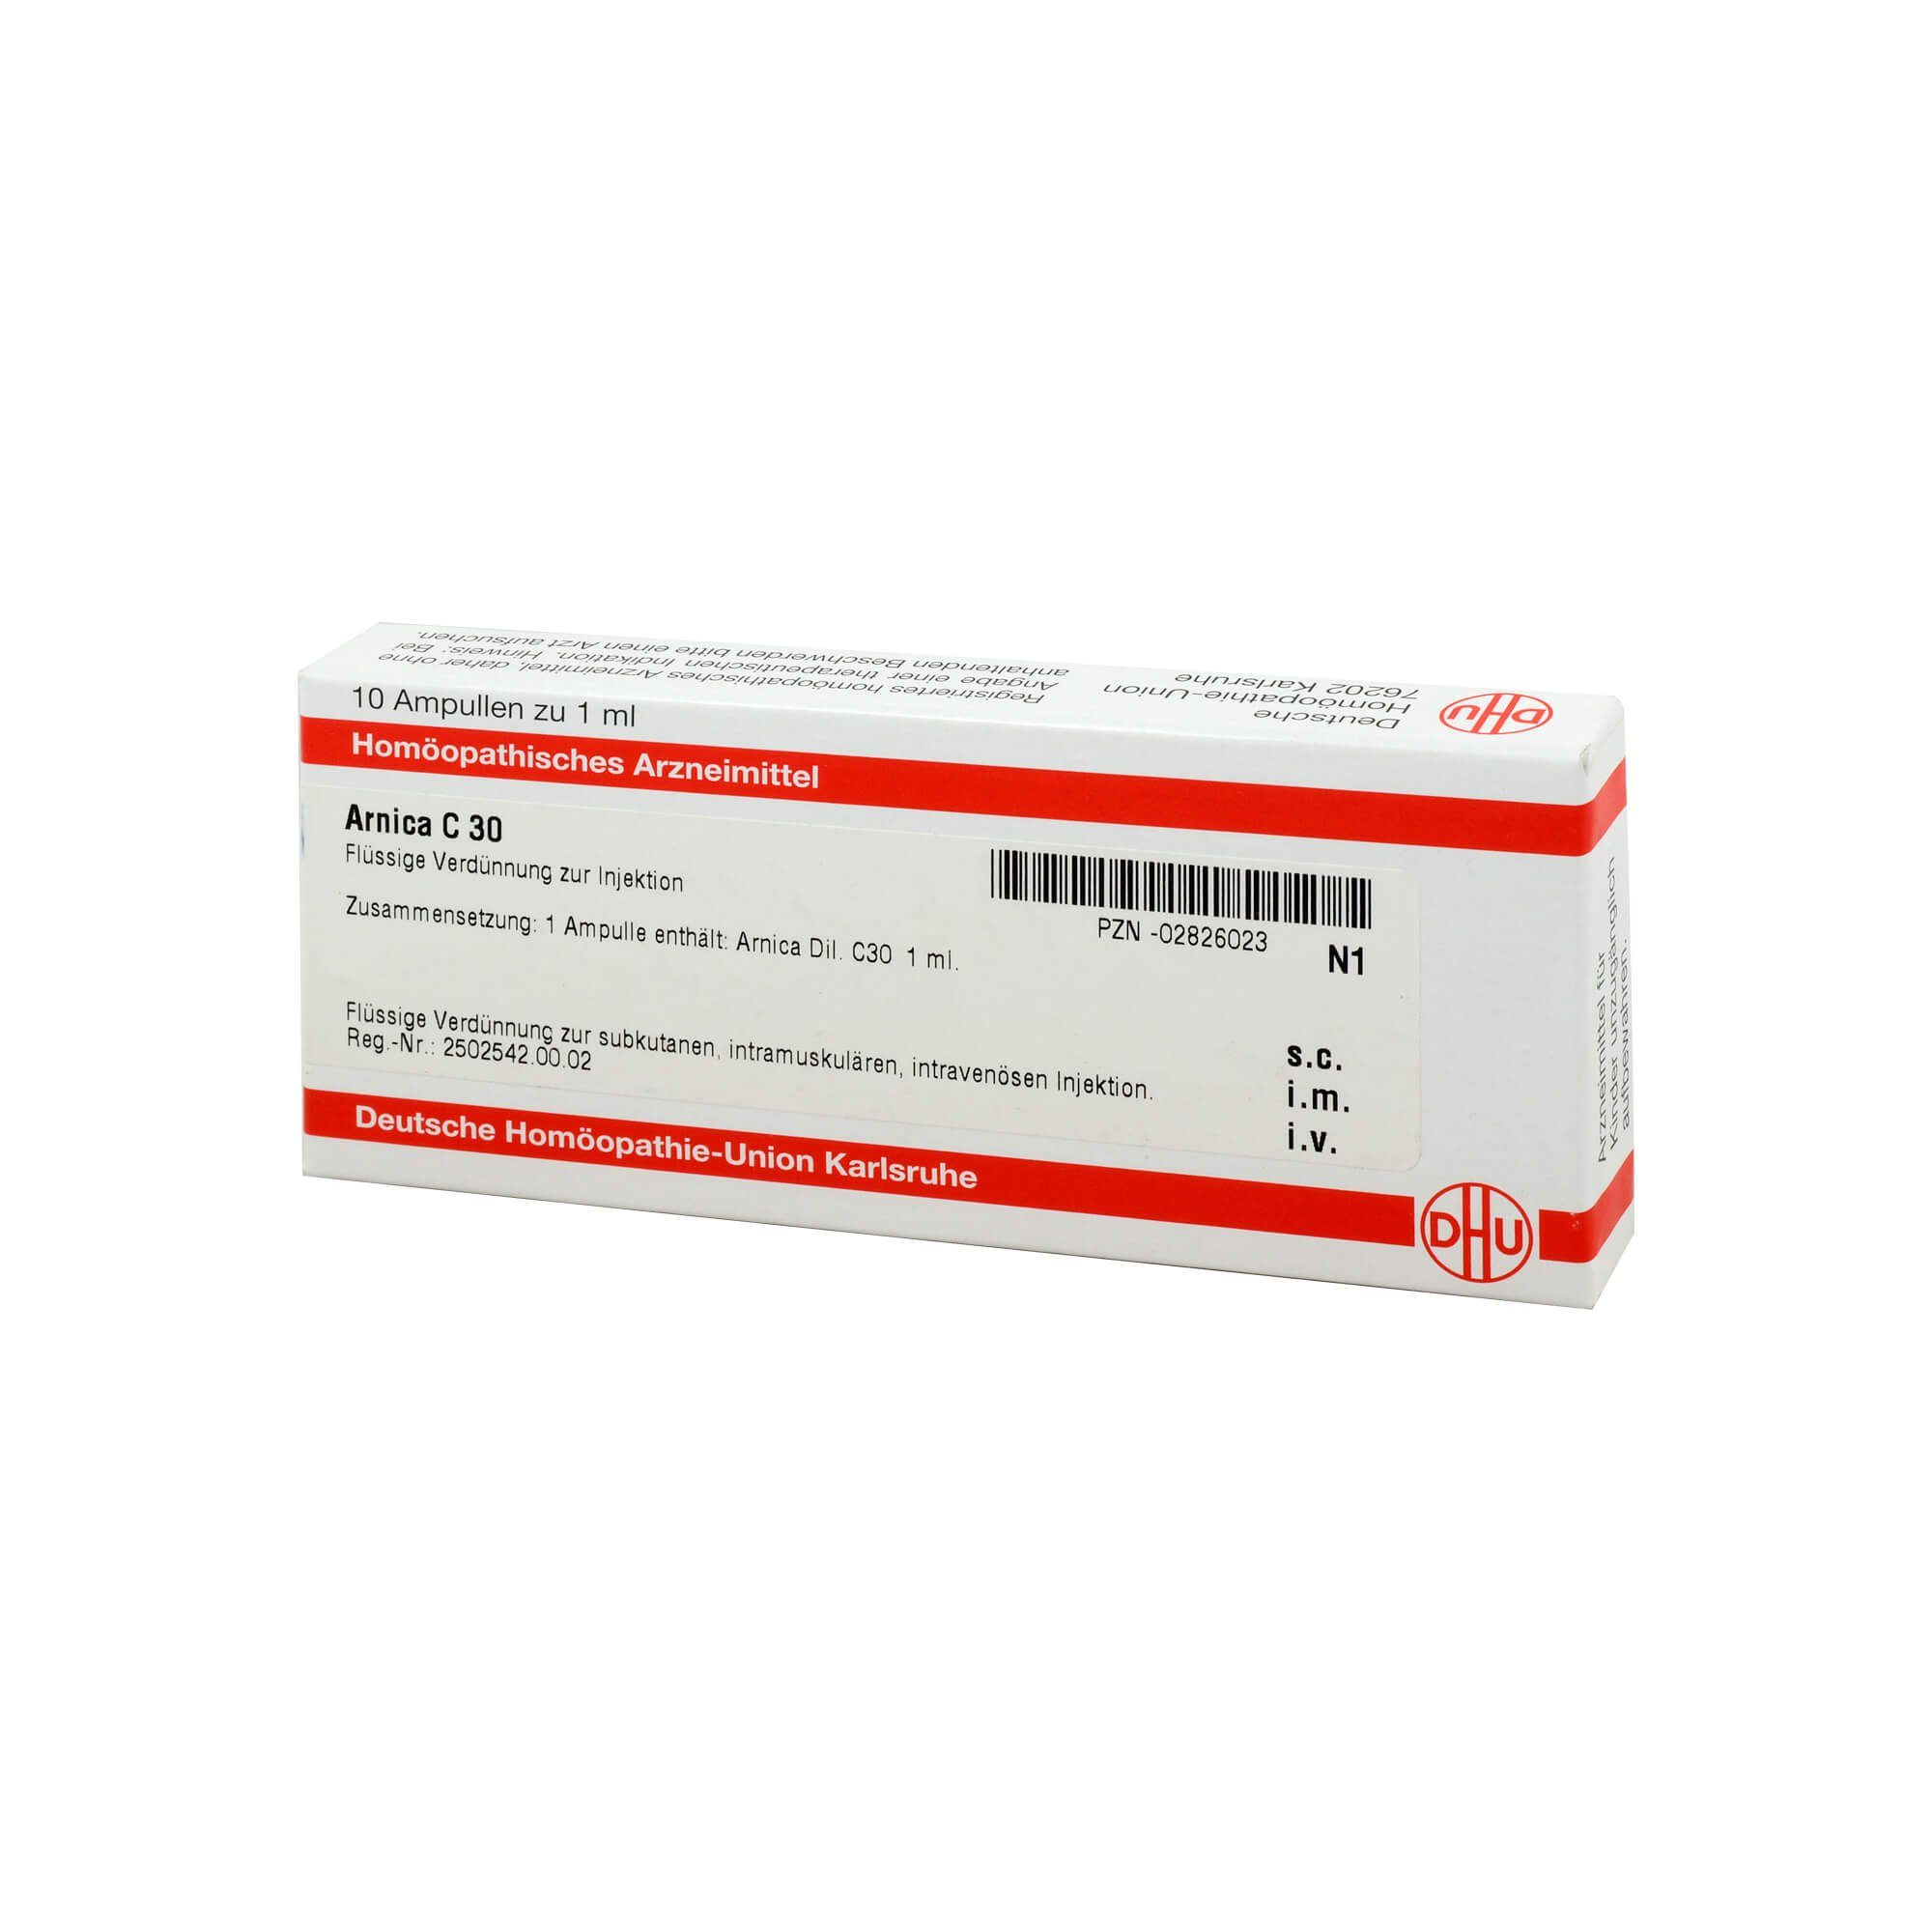 Arnica C 30 Ampullen , 10X1 ml